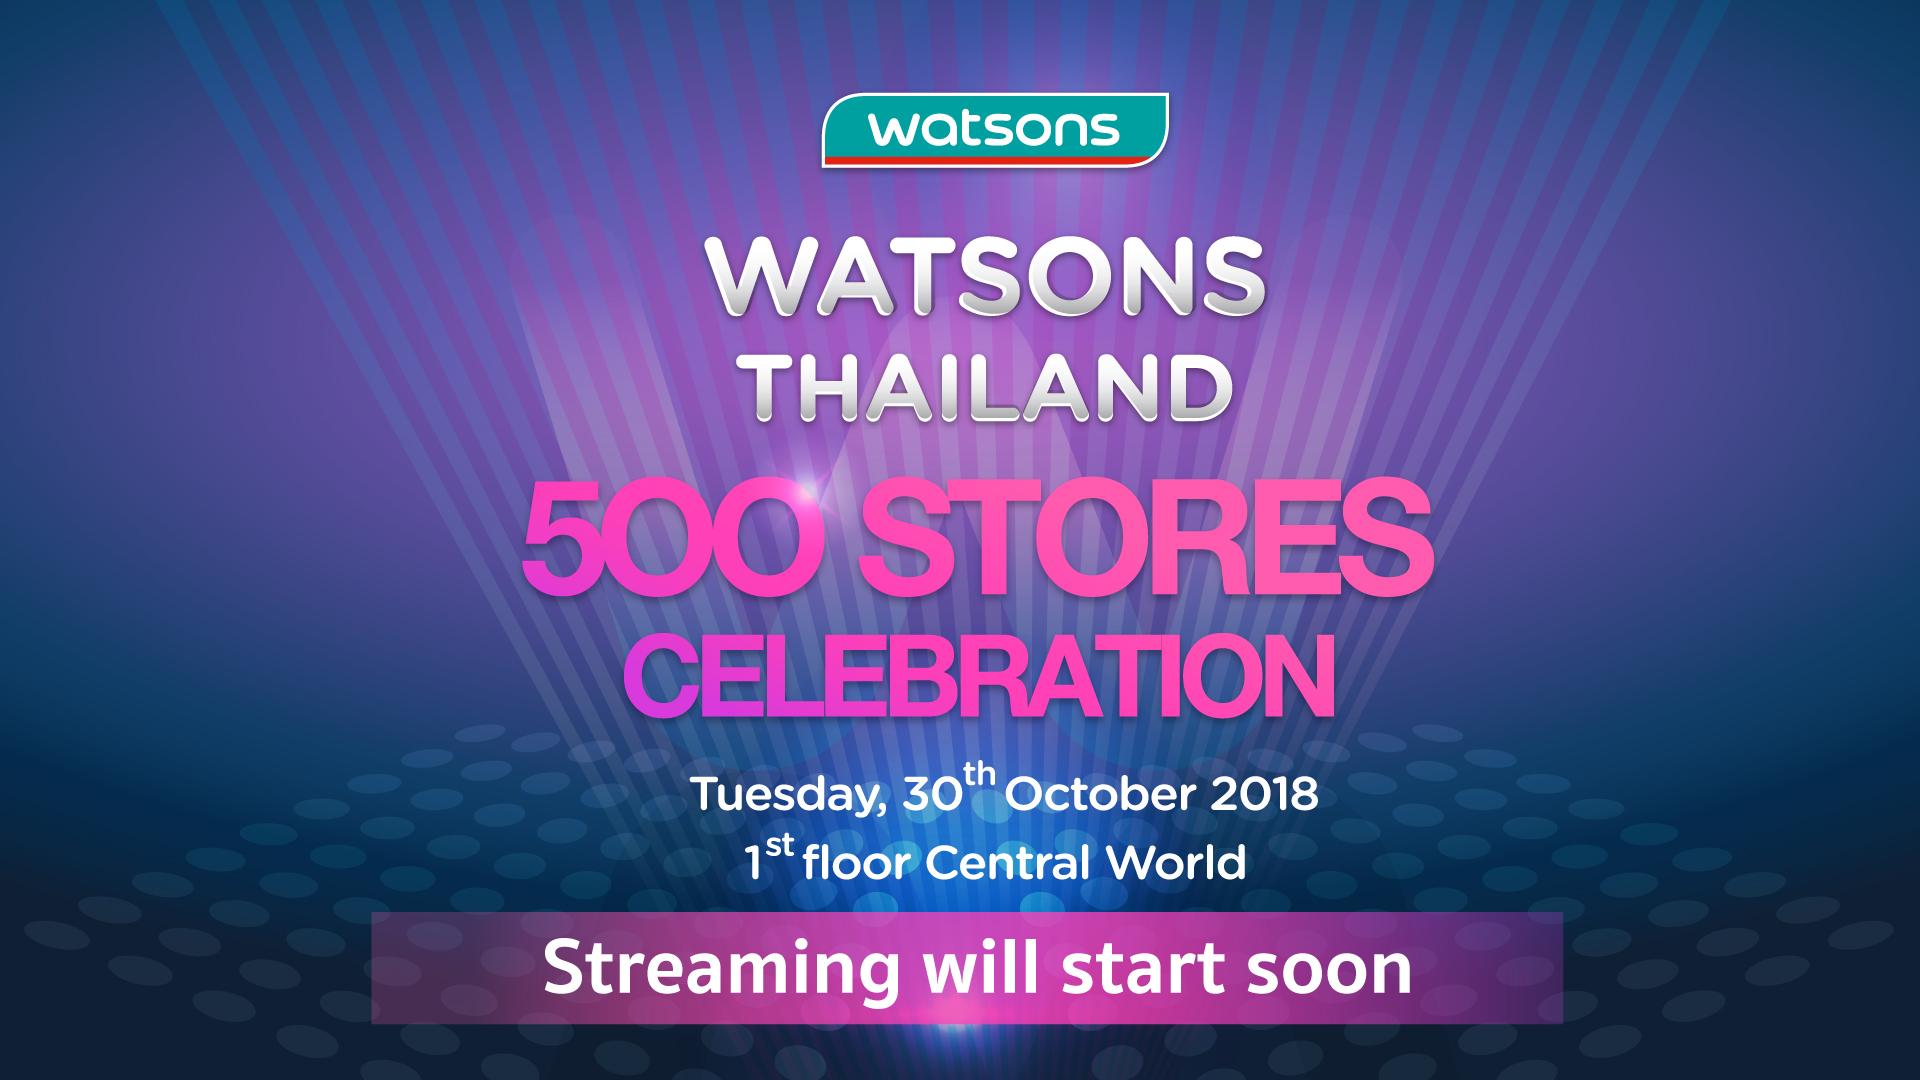 Watsons 500 Stores Celebration